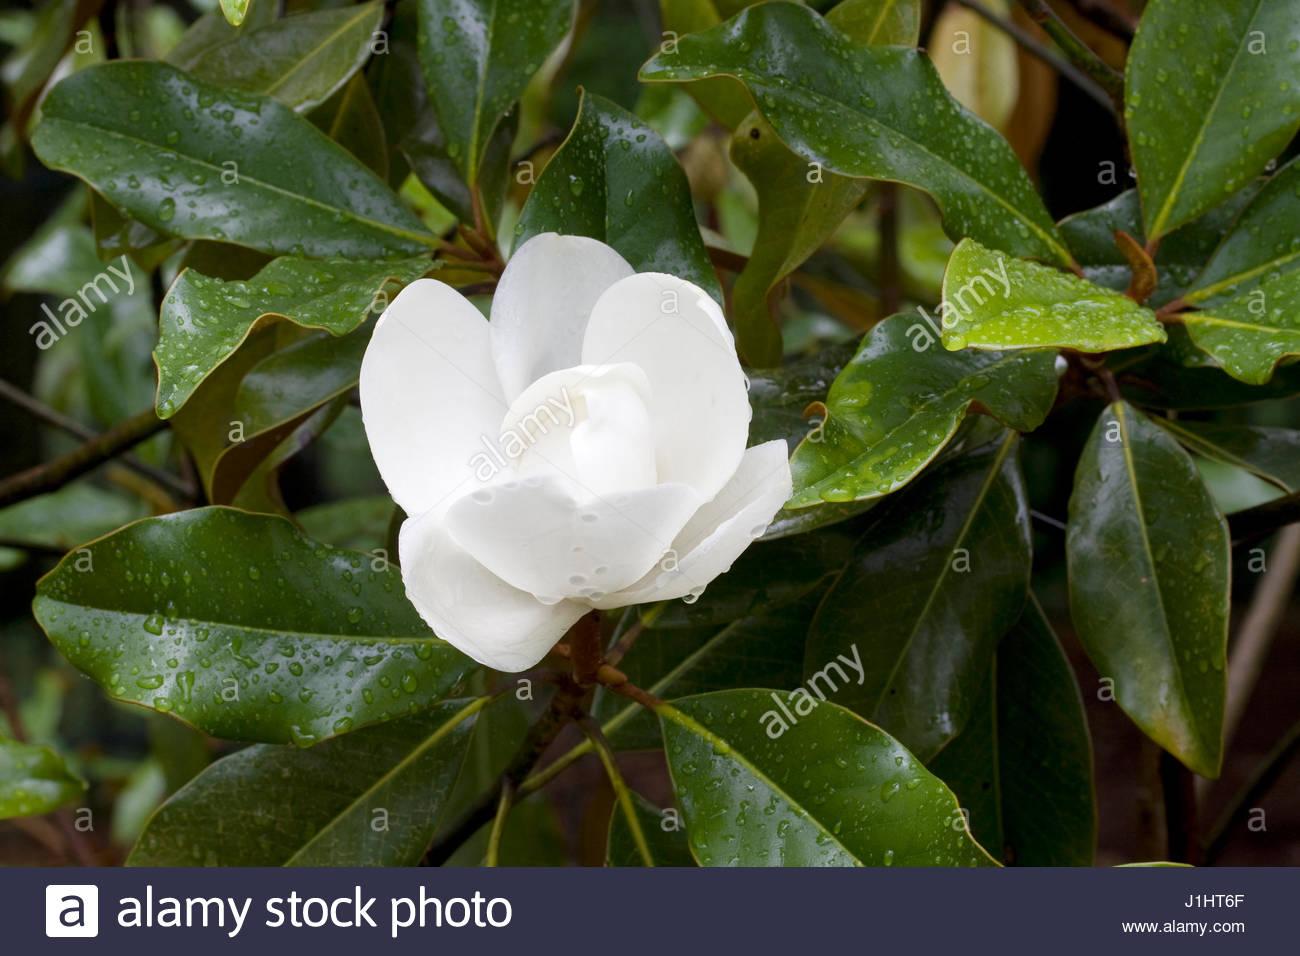 Magnolia grandiflora tree stock photos magnolia - Magnolia grandiflora ...